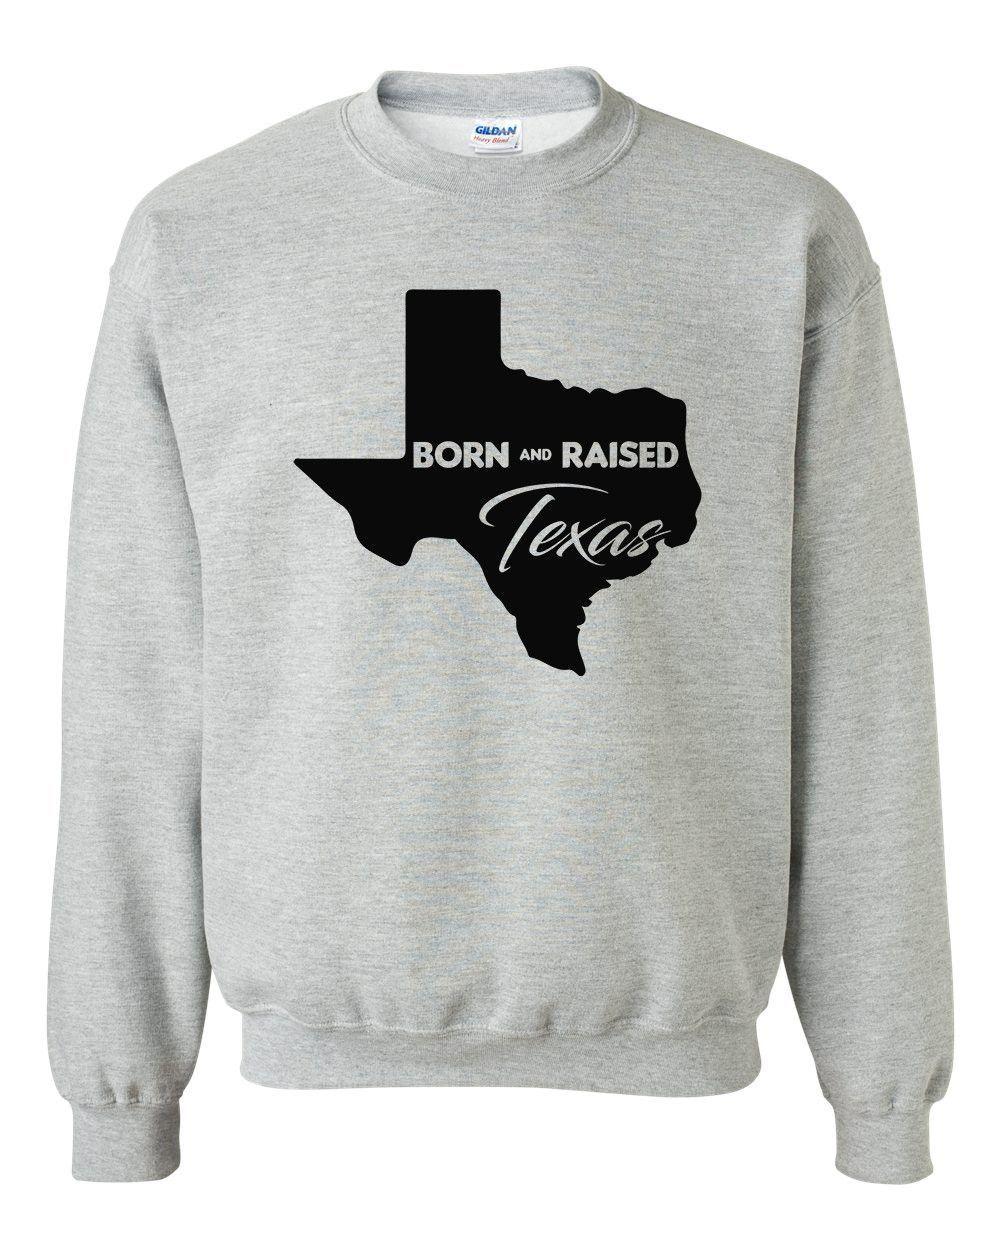 Born And Raised Texas Crewneck Sweatshirt Sweatshirts Crew Neck Sweatshirt Hunting Tshirts [ 1250 x 1000 Pixel ]